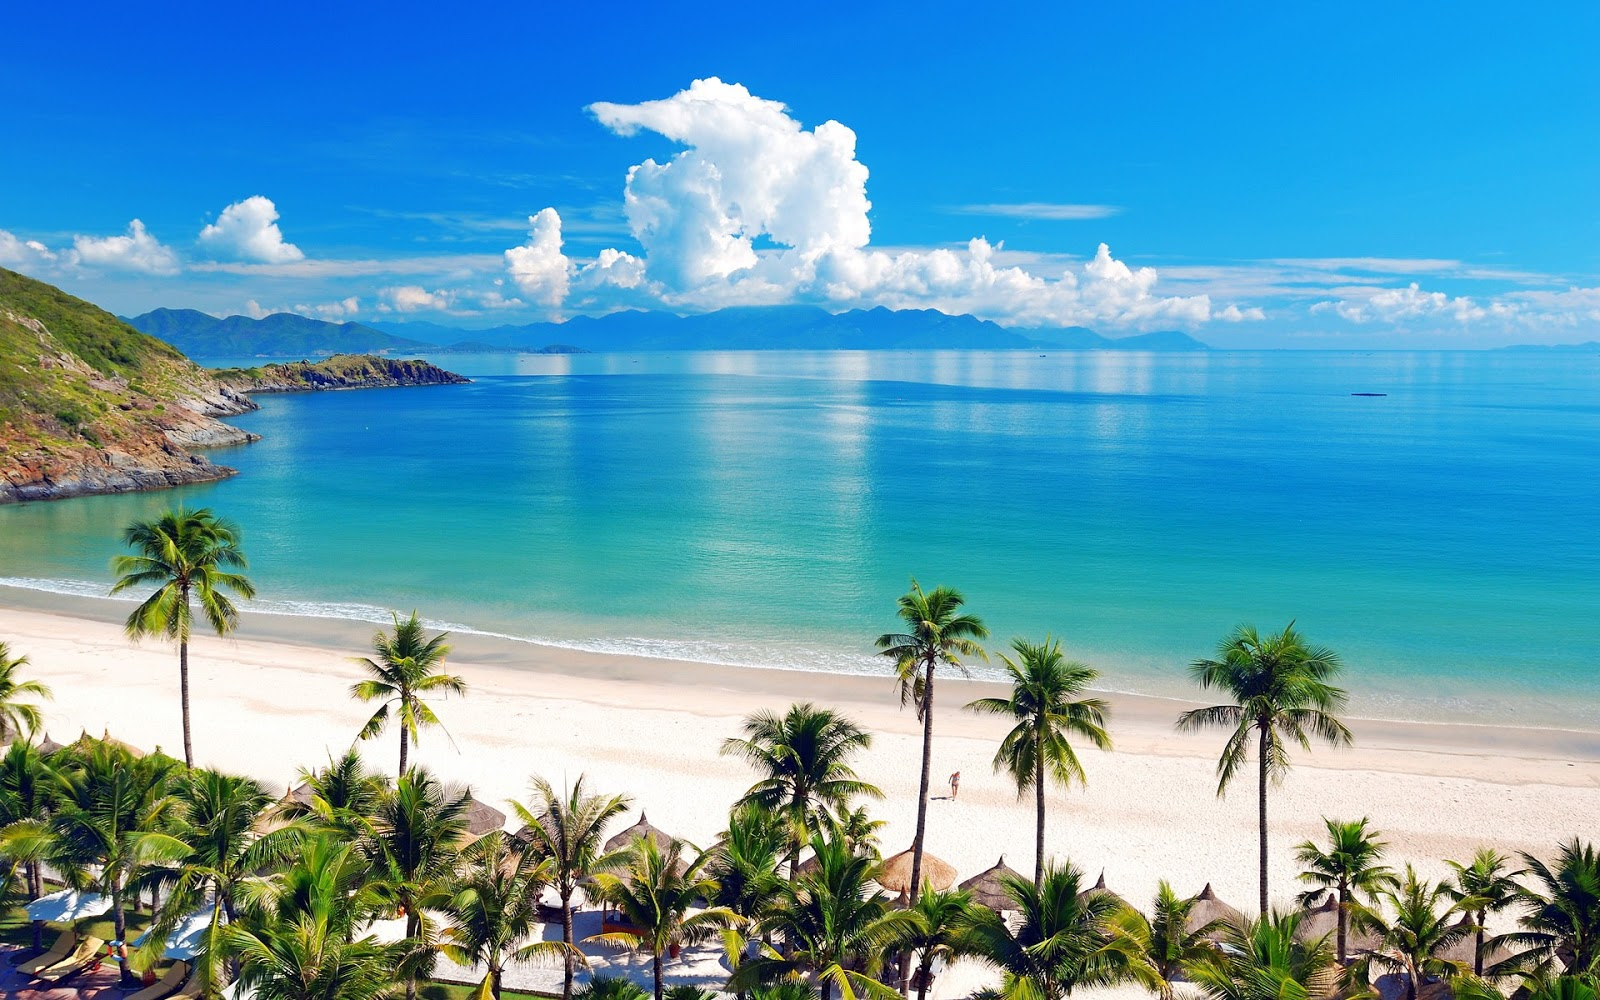 paysage plage fond d ecran fond d ecran